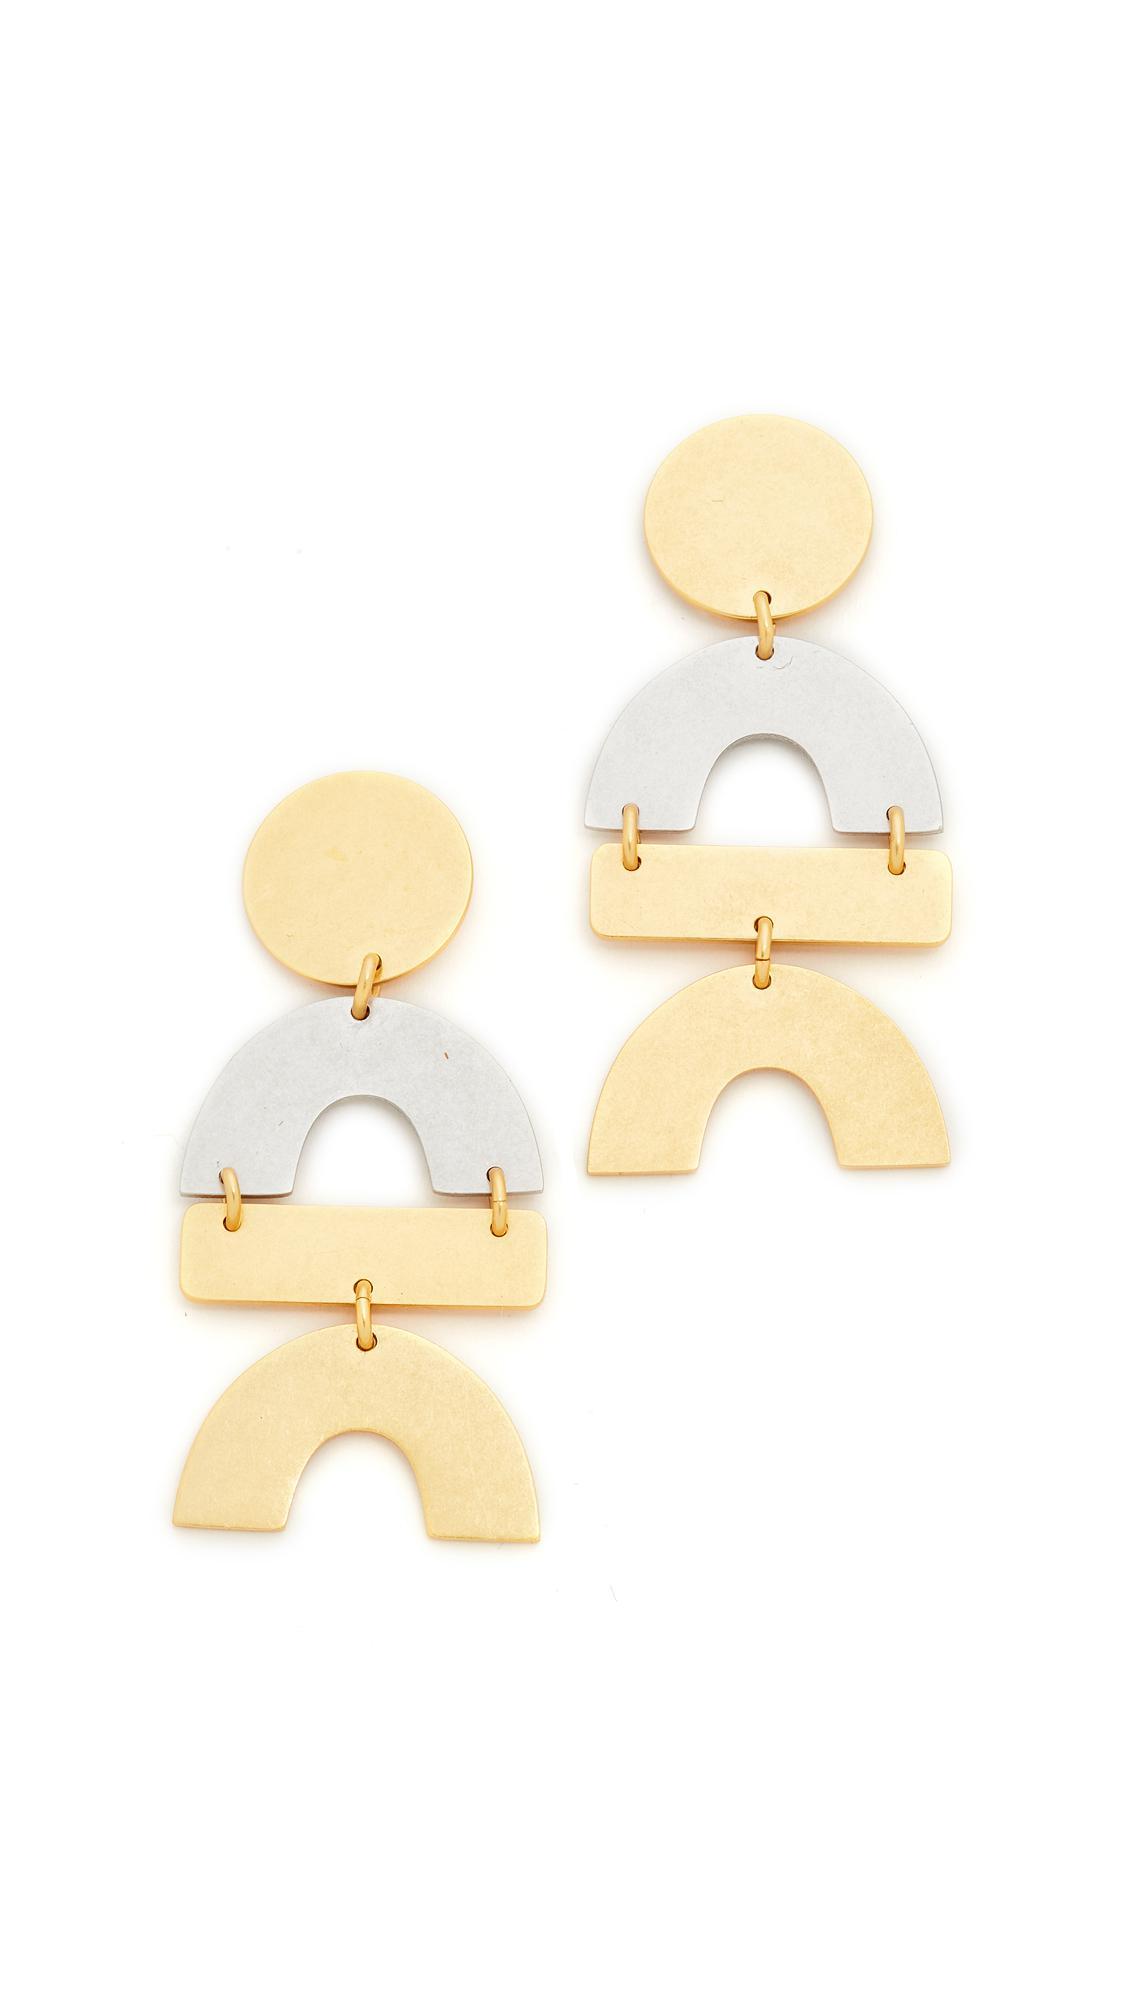 Madewell Matisse Statement Earrings qQDQr